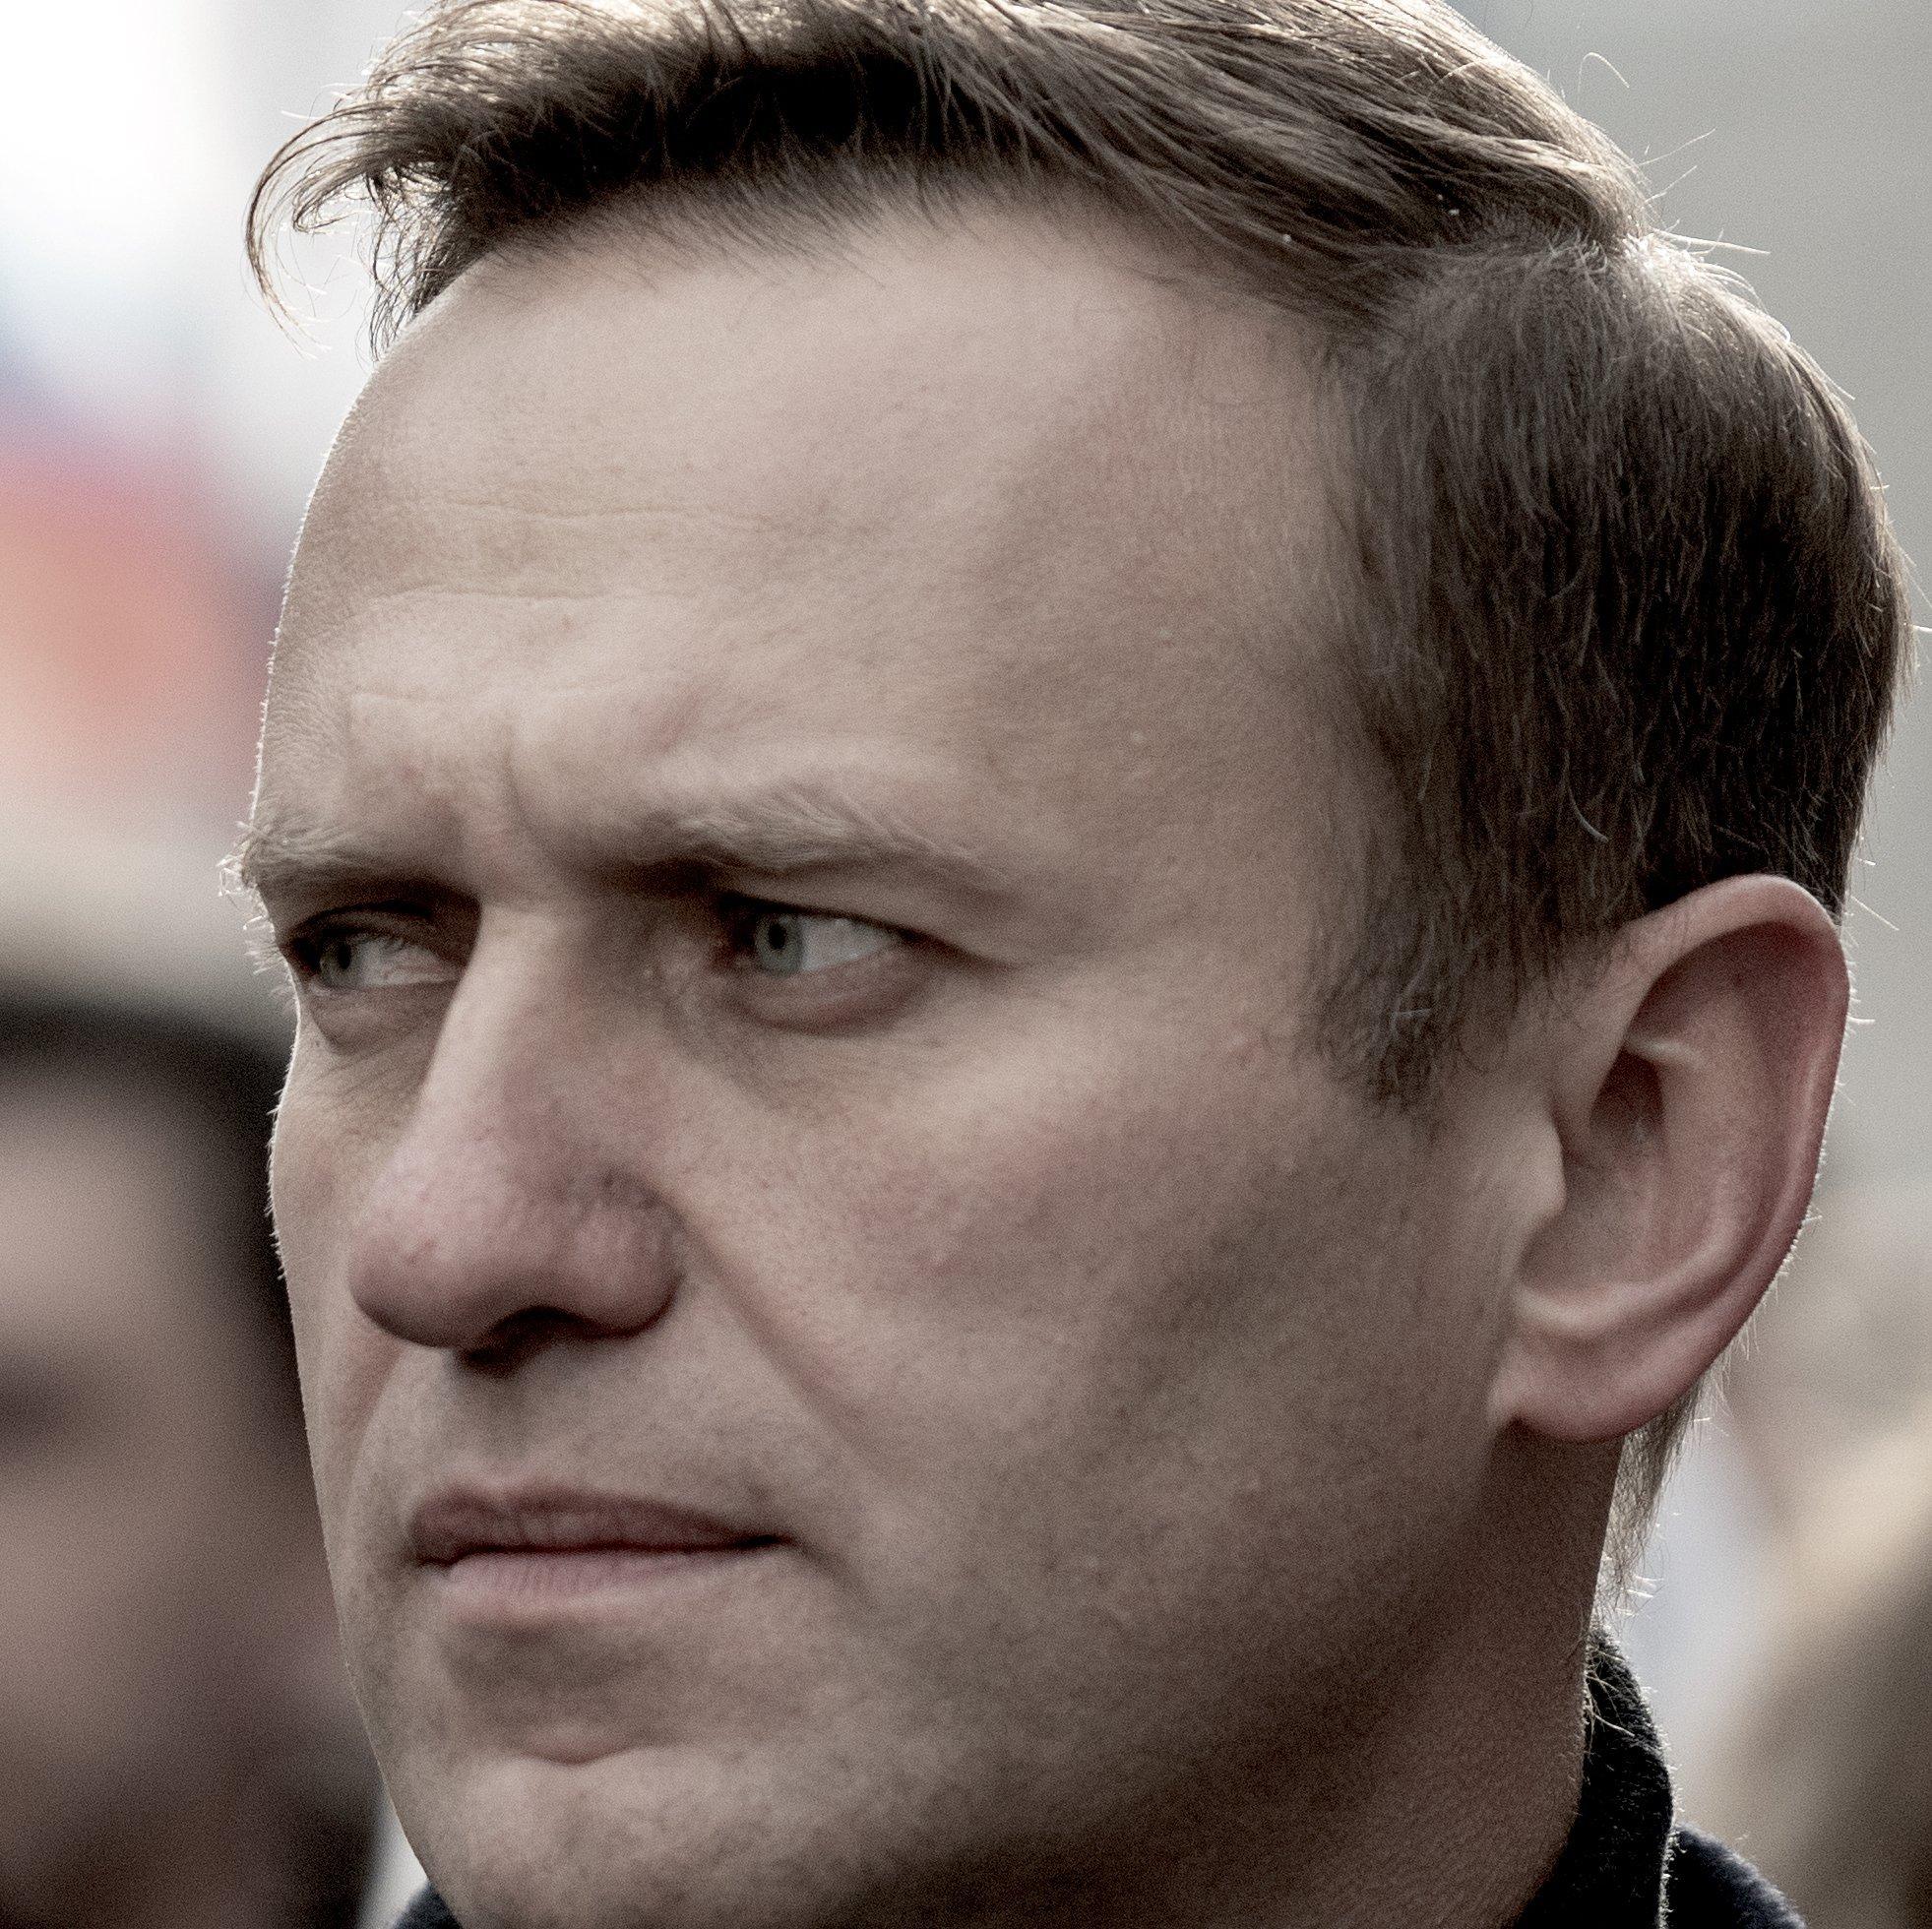 Listen: Could Putin Foe Navalny 'Die Any Minute'?